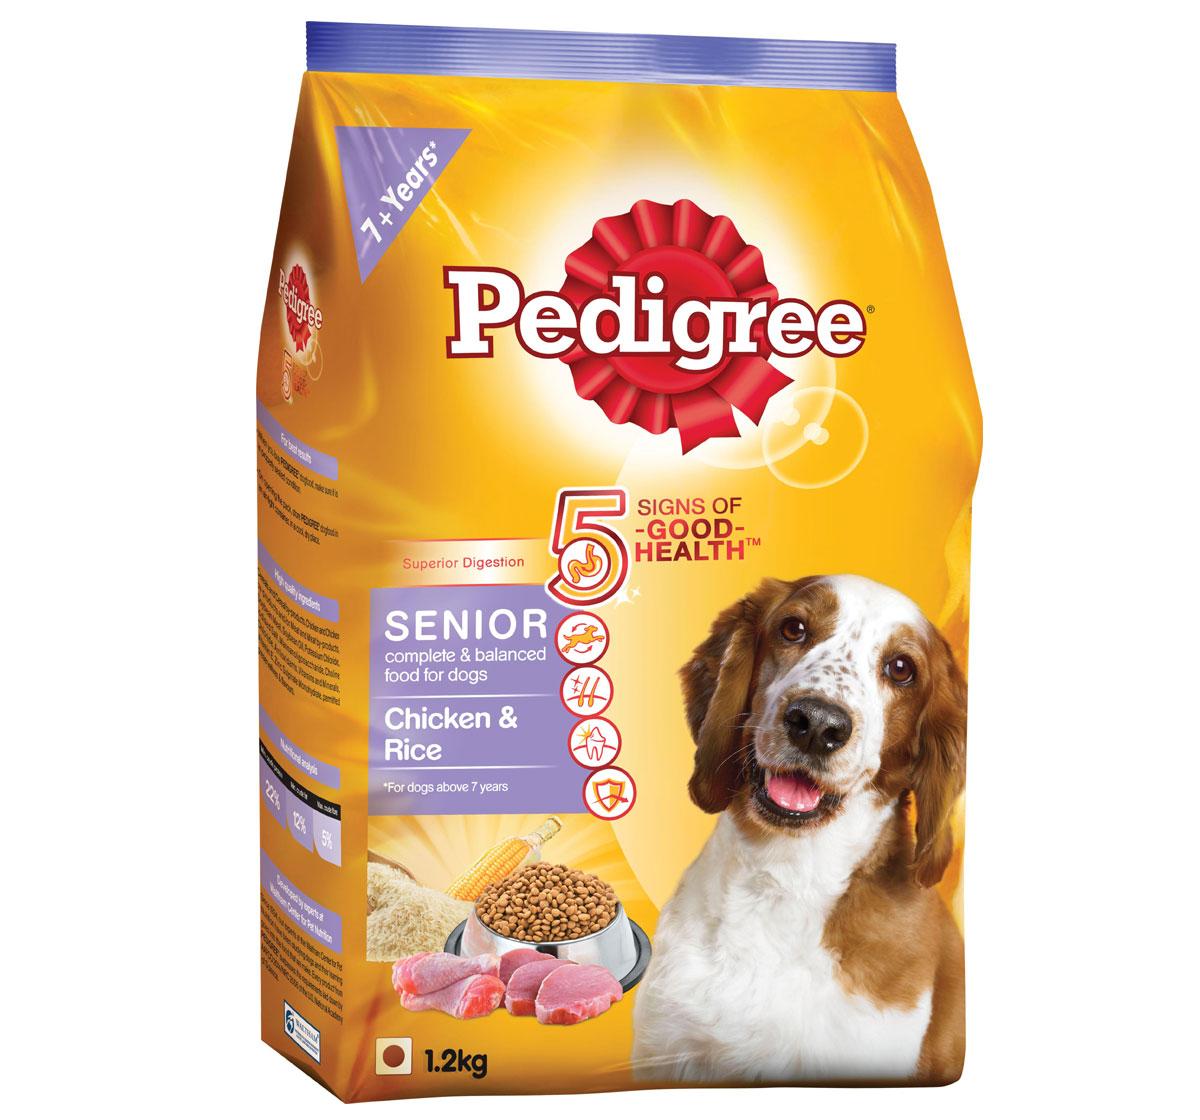 Pedigree Senior Dry Dog Food